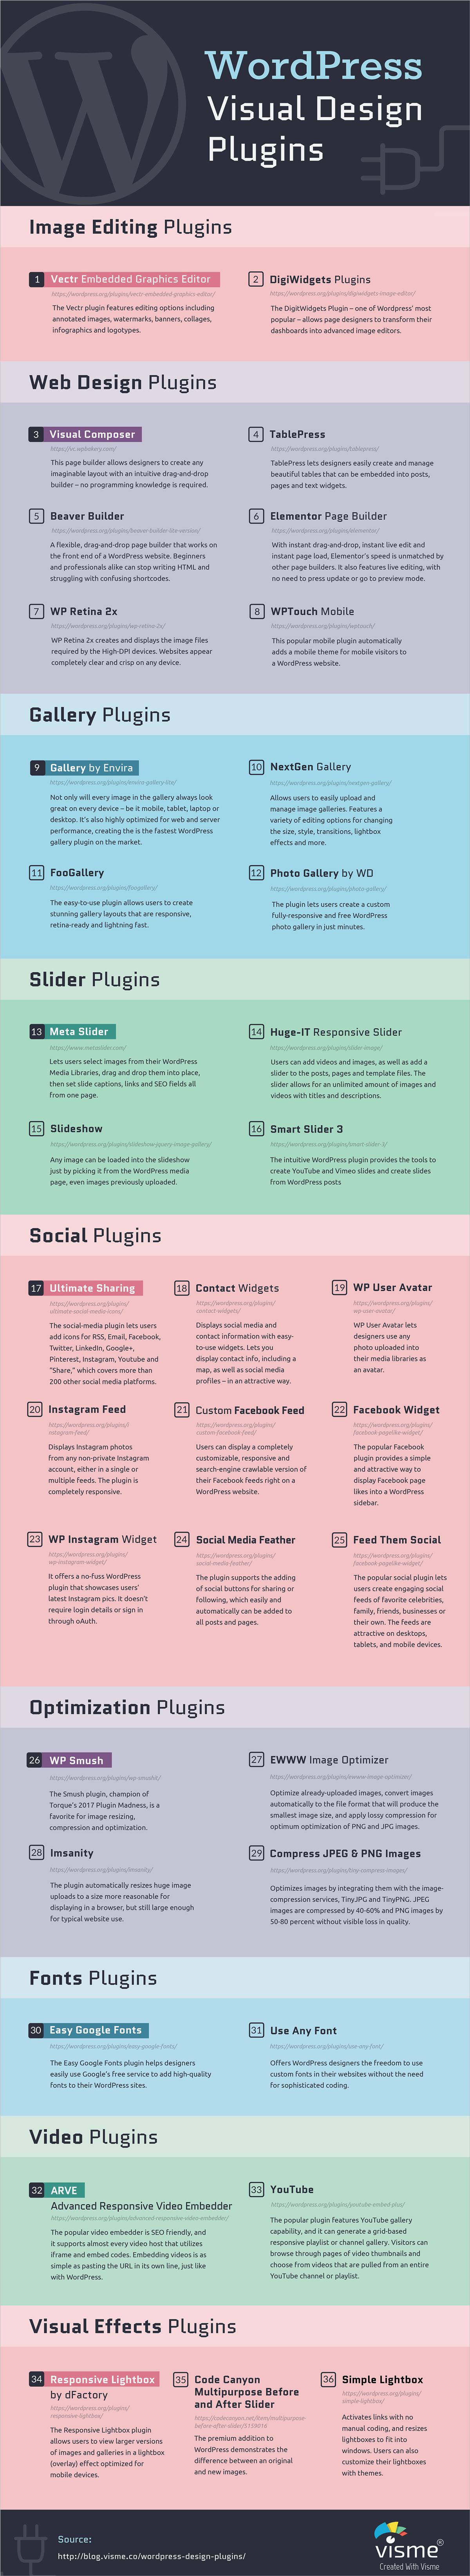 Visme-36-WordPress-Visual-Design-Plugins